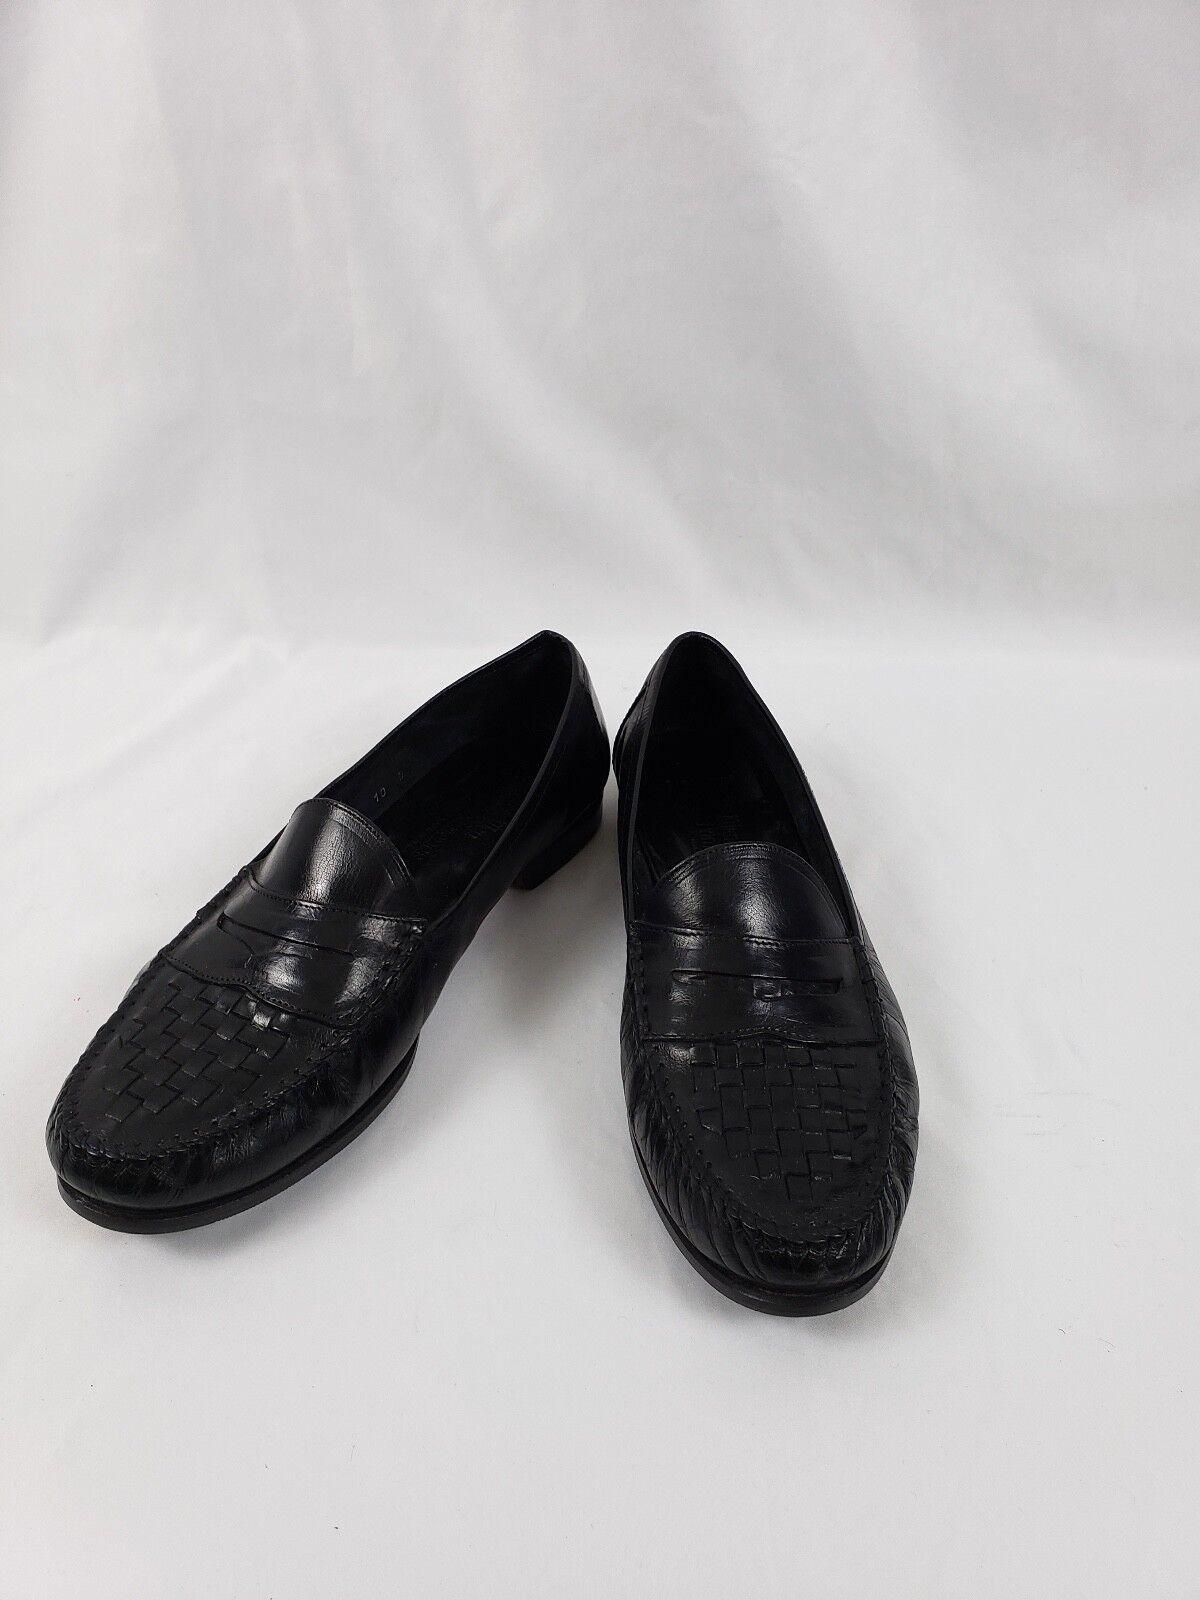 Allen Edmonds Barbados penny loafers black sz 10d